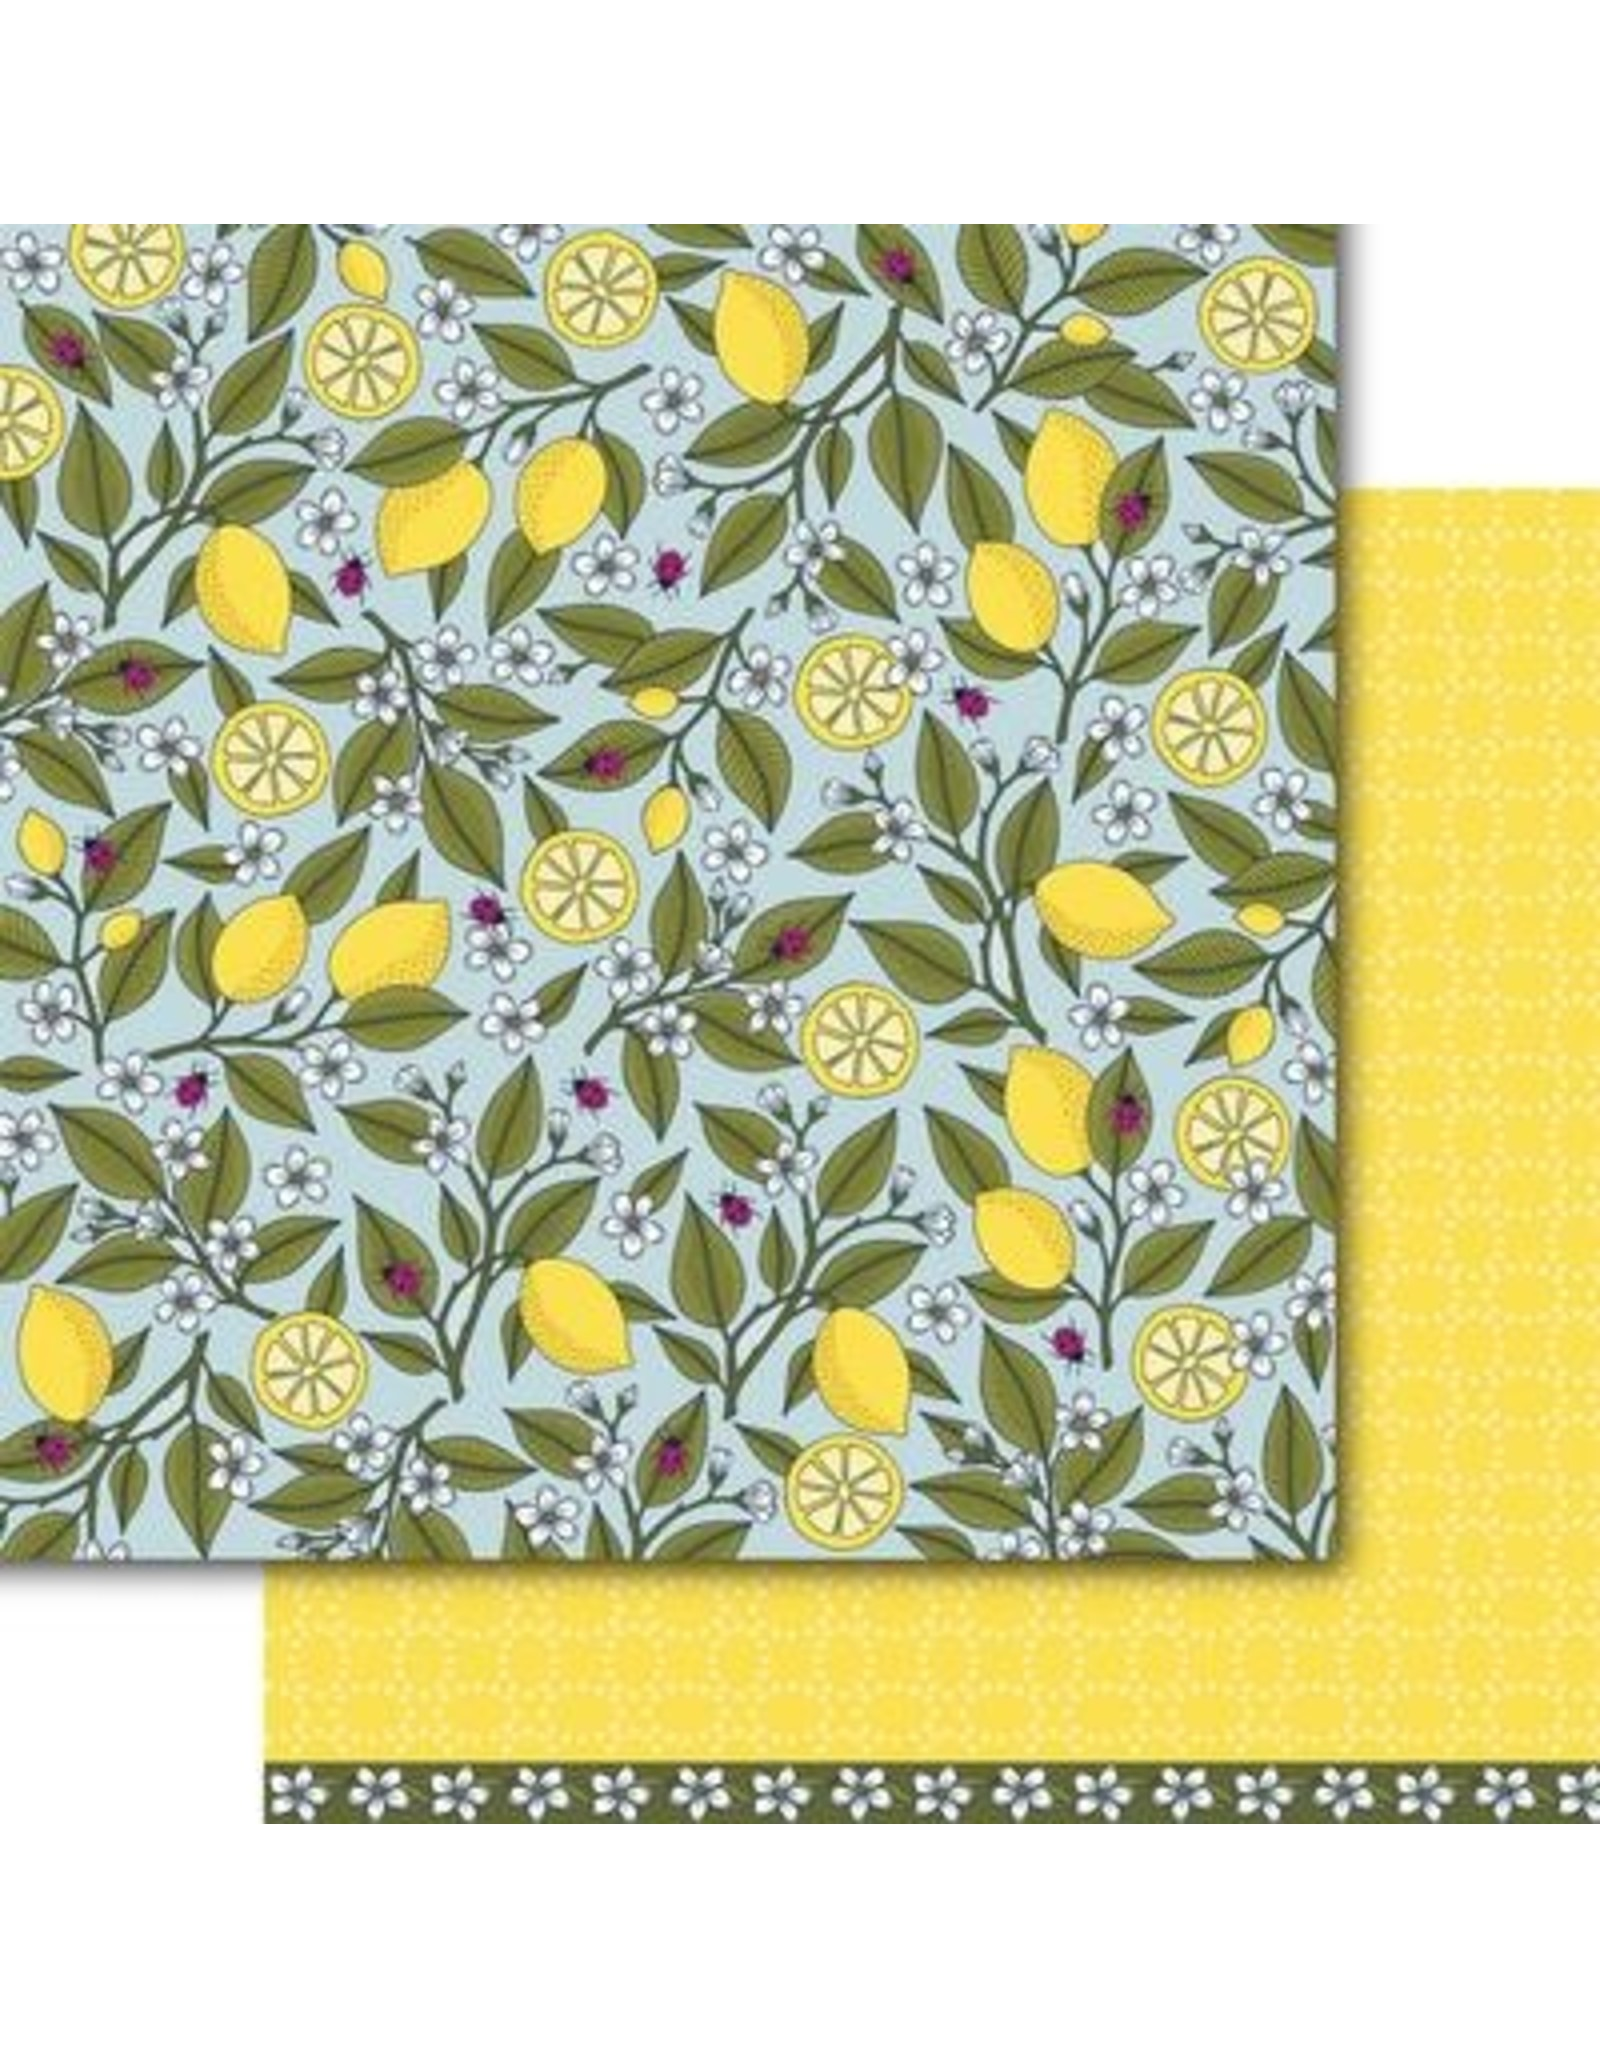 Dare 2B Artzy Lemon Zest - Clear Stamp Set